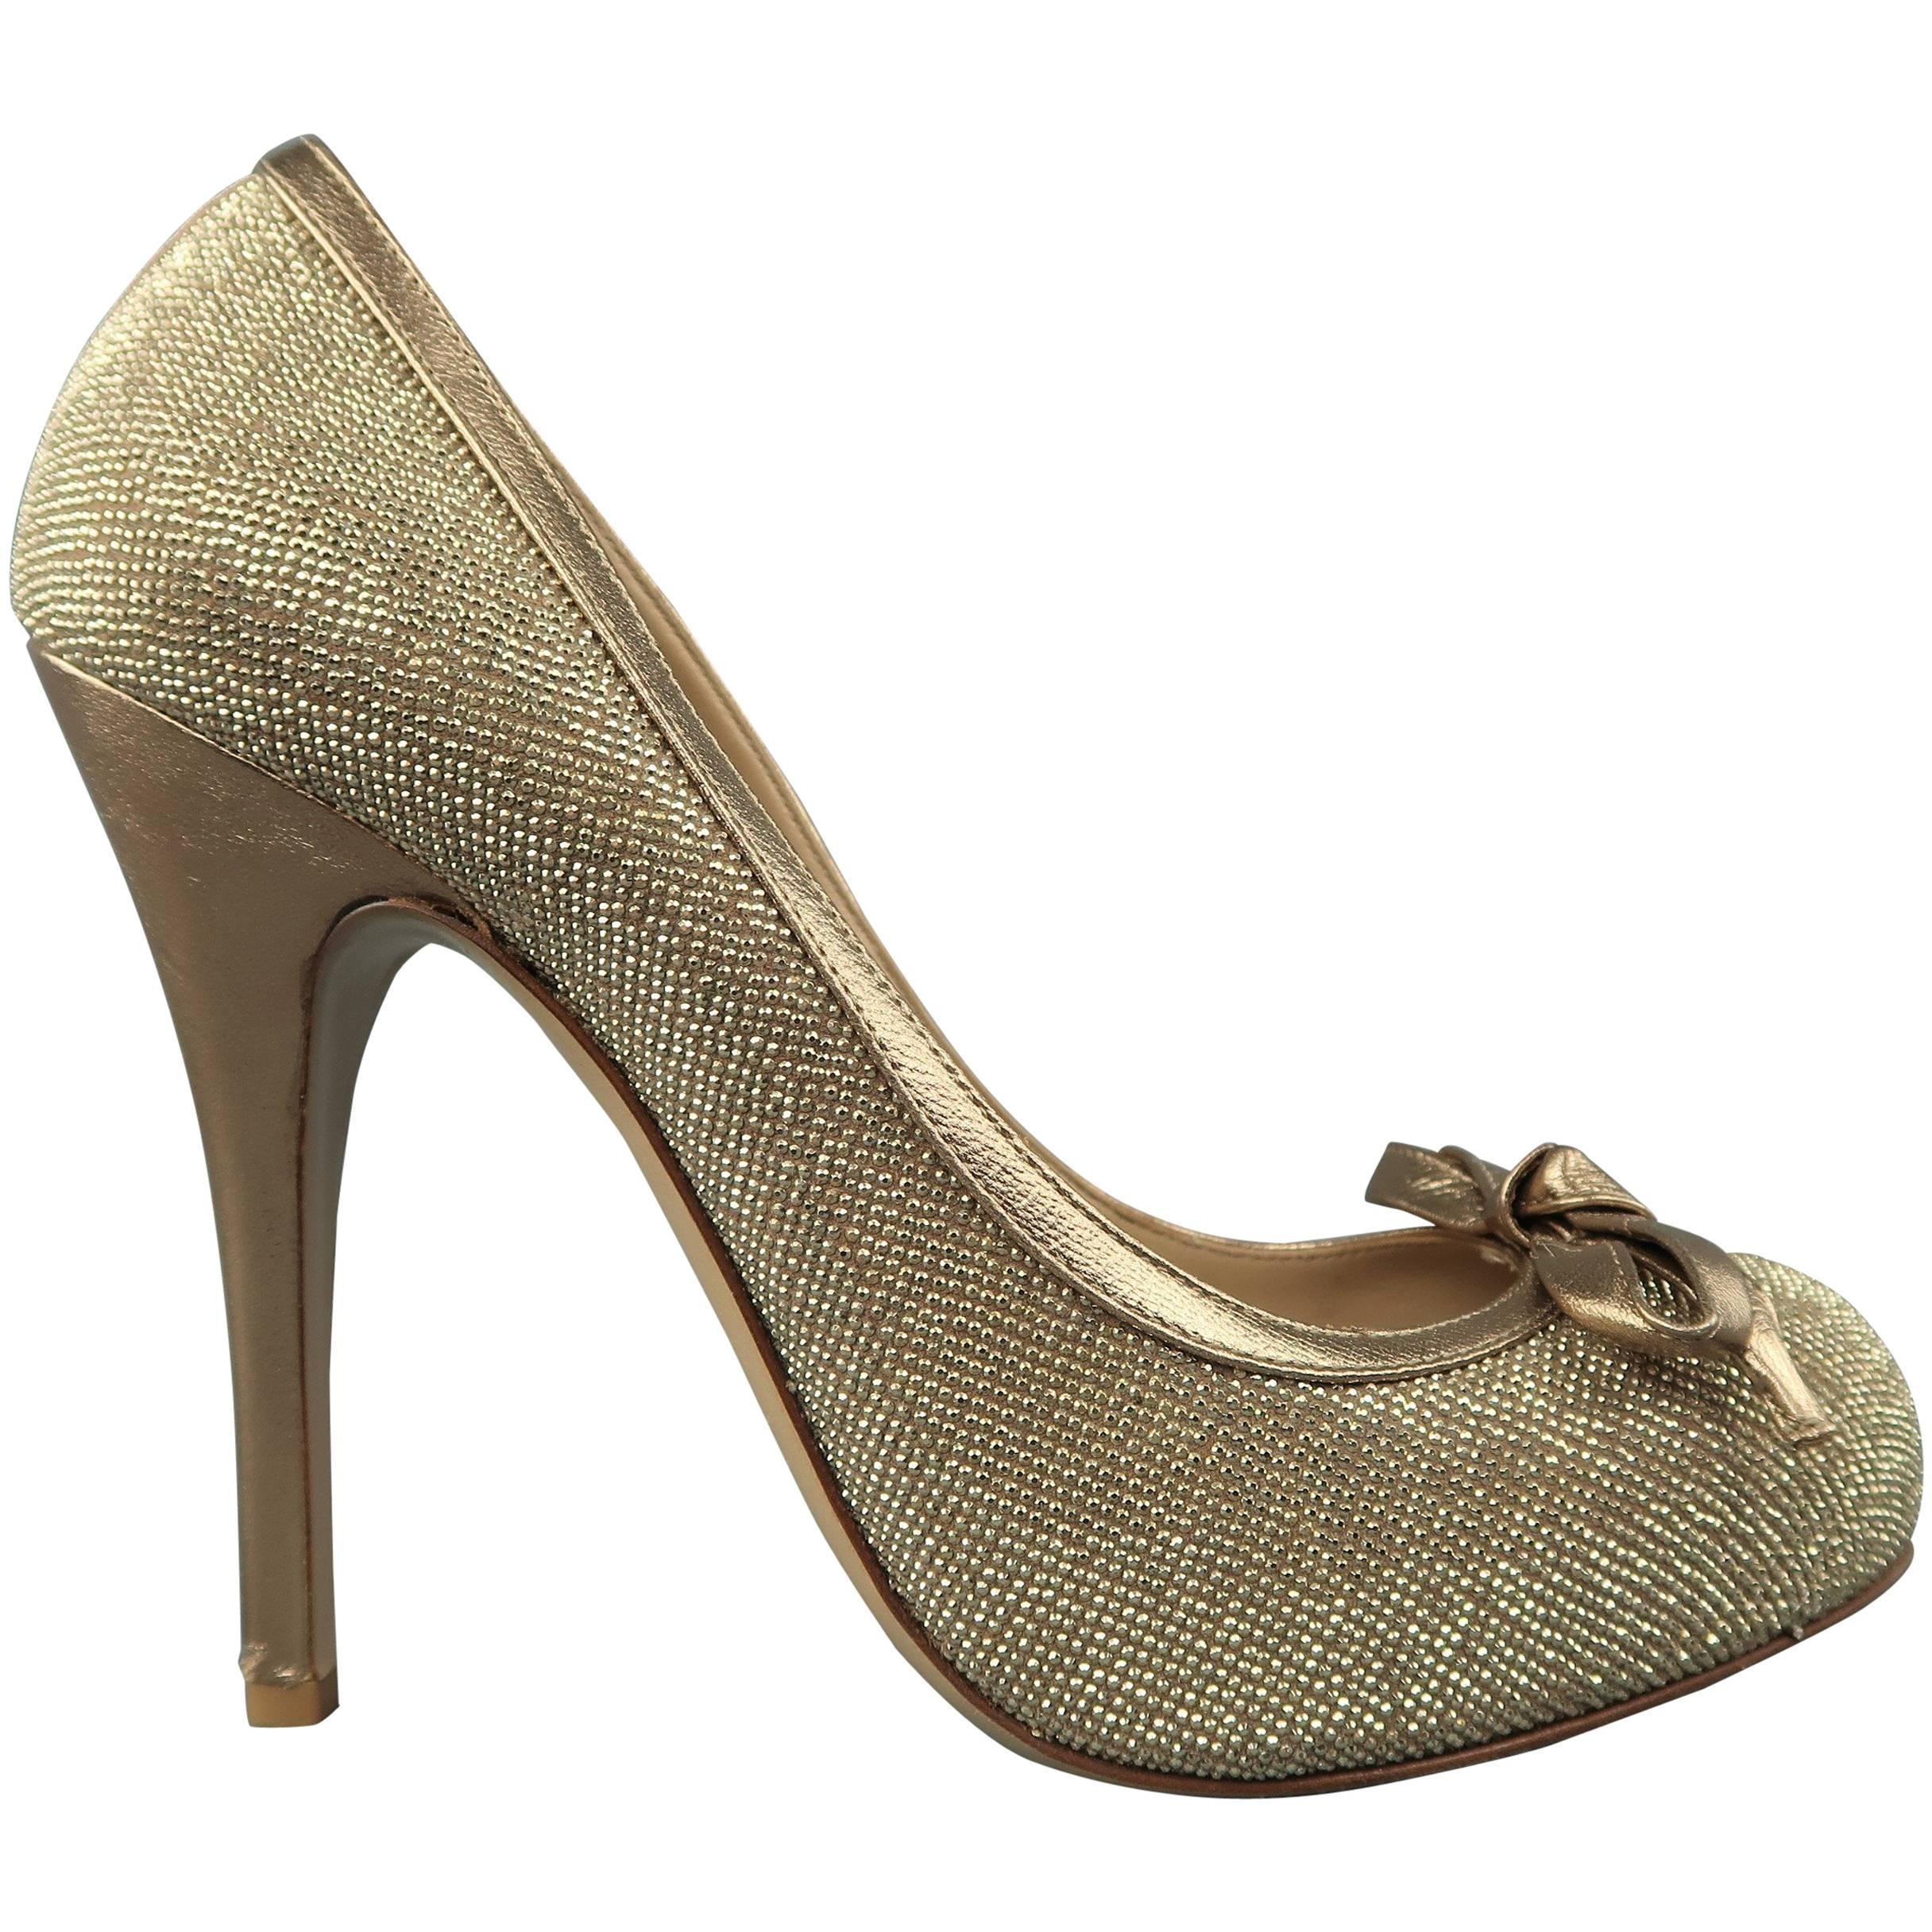 VALENTINO Size 9 Gold Crystal Studded Leather Platform Bow Pumps